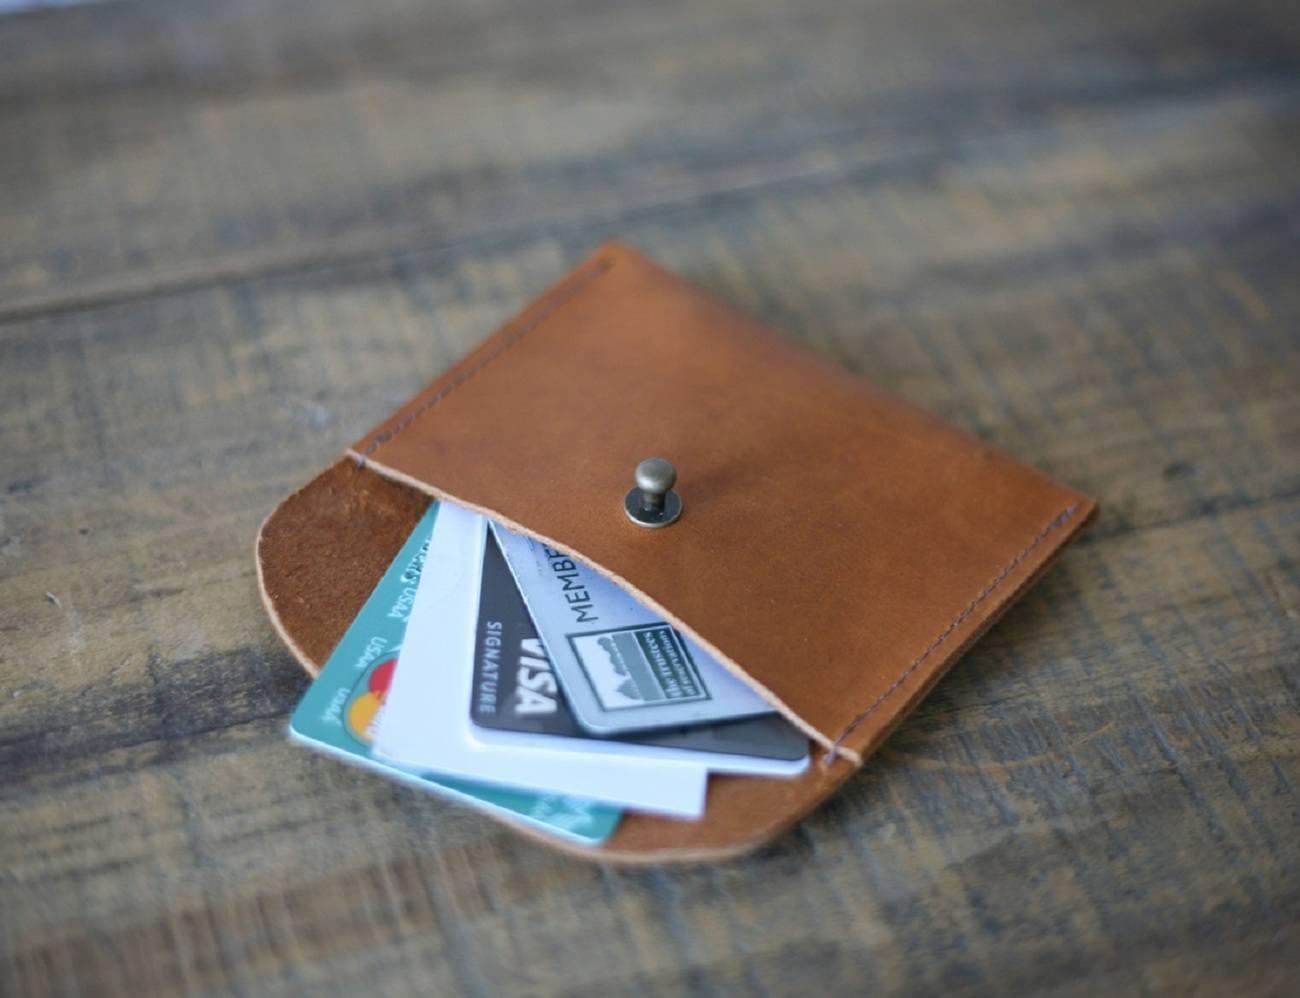 Elliot Wallet by Forestbound